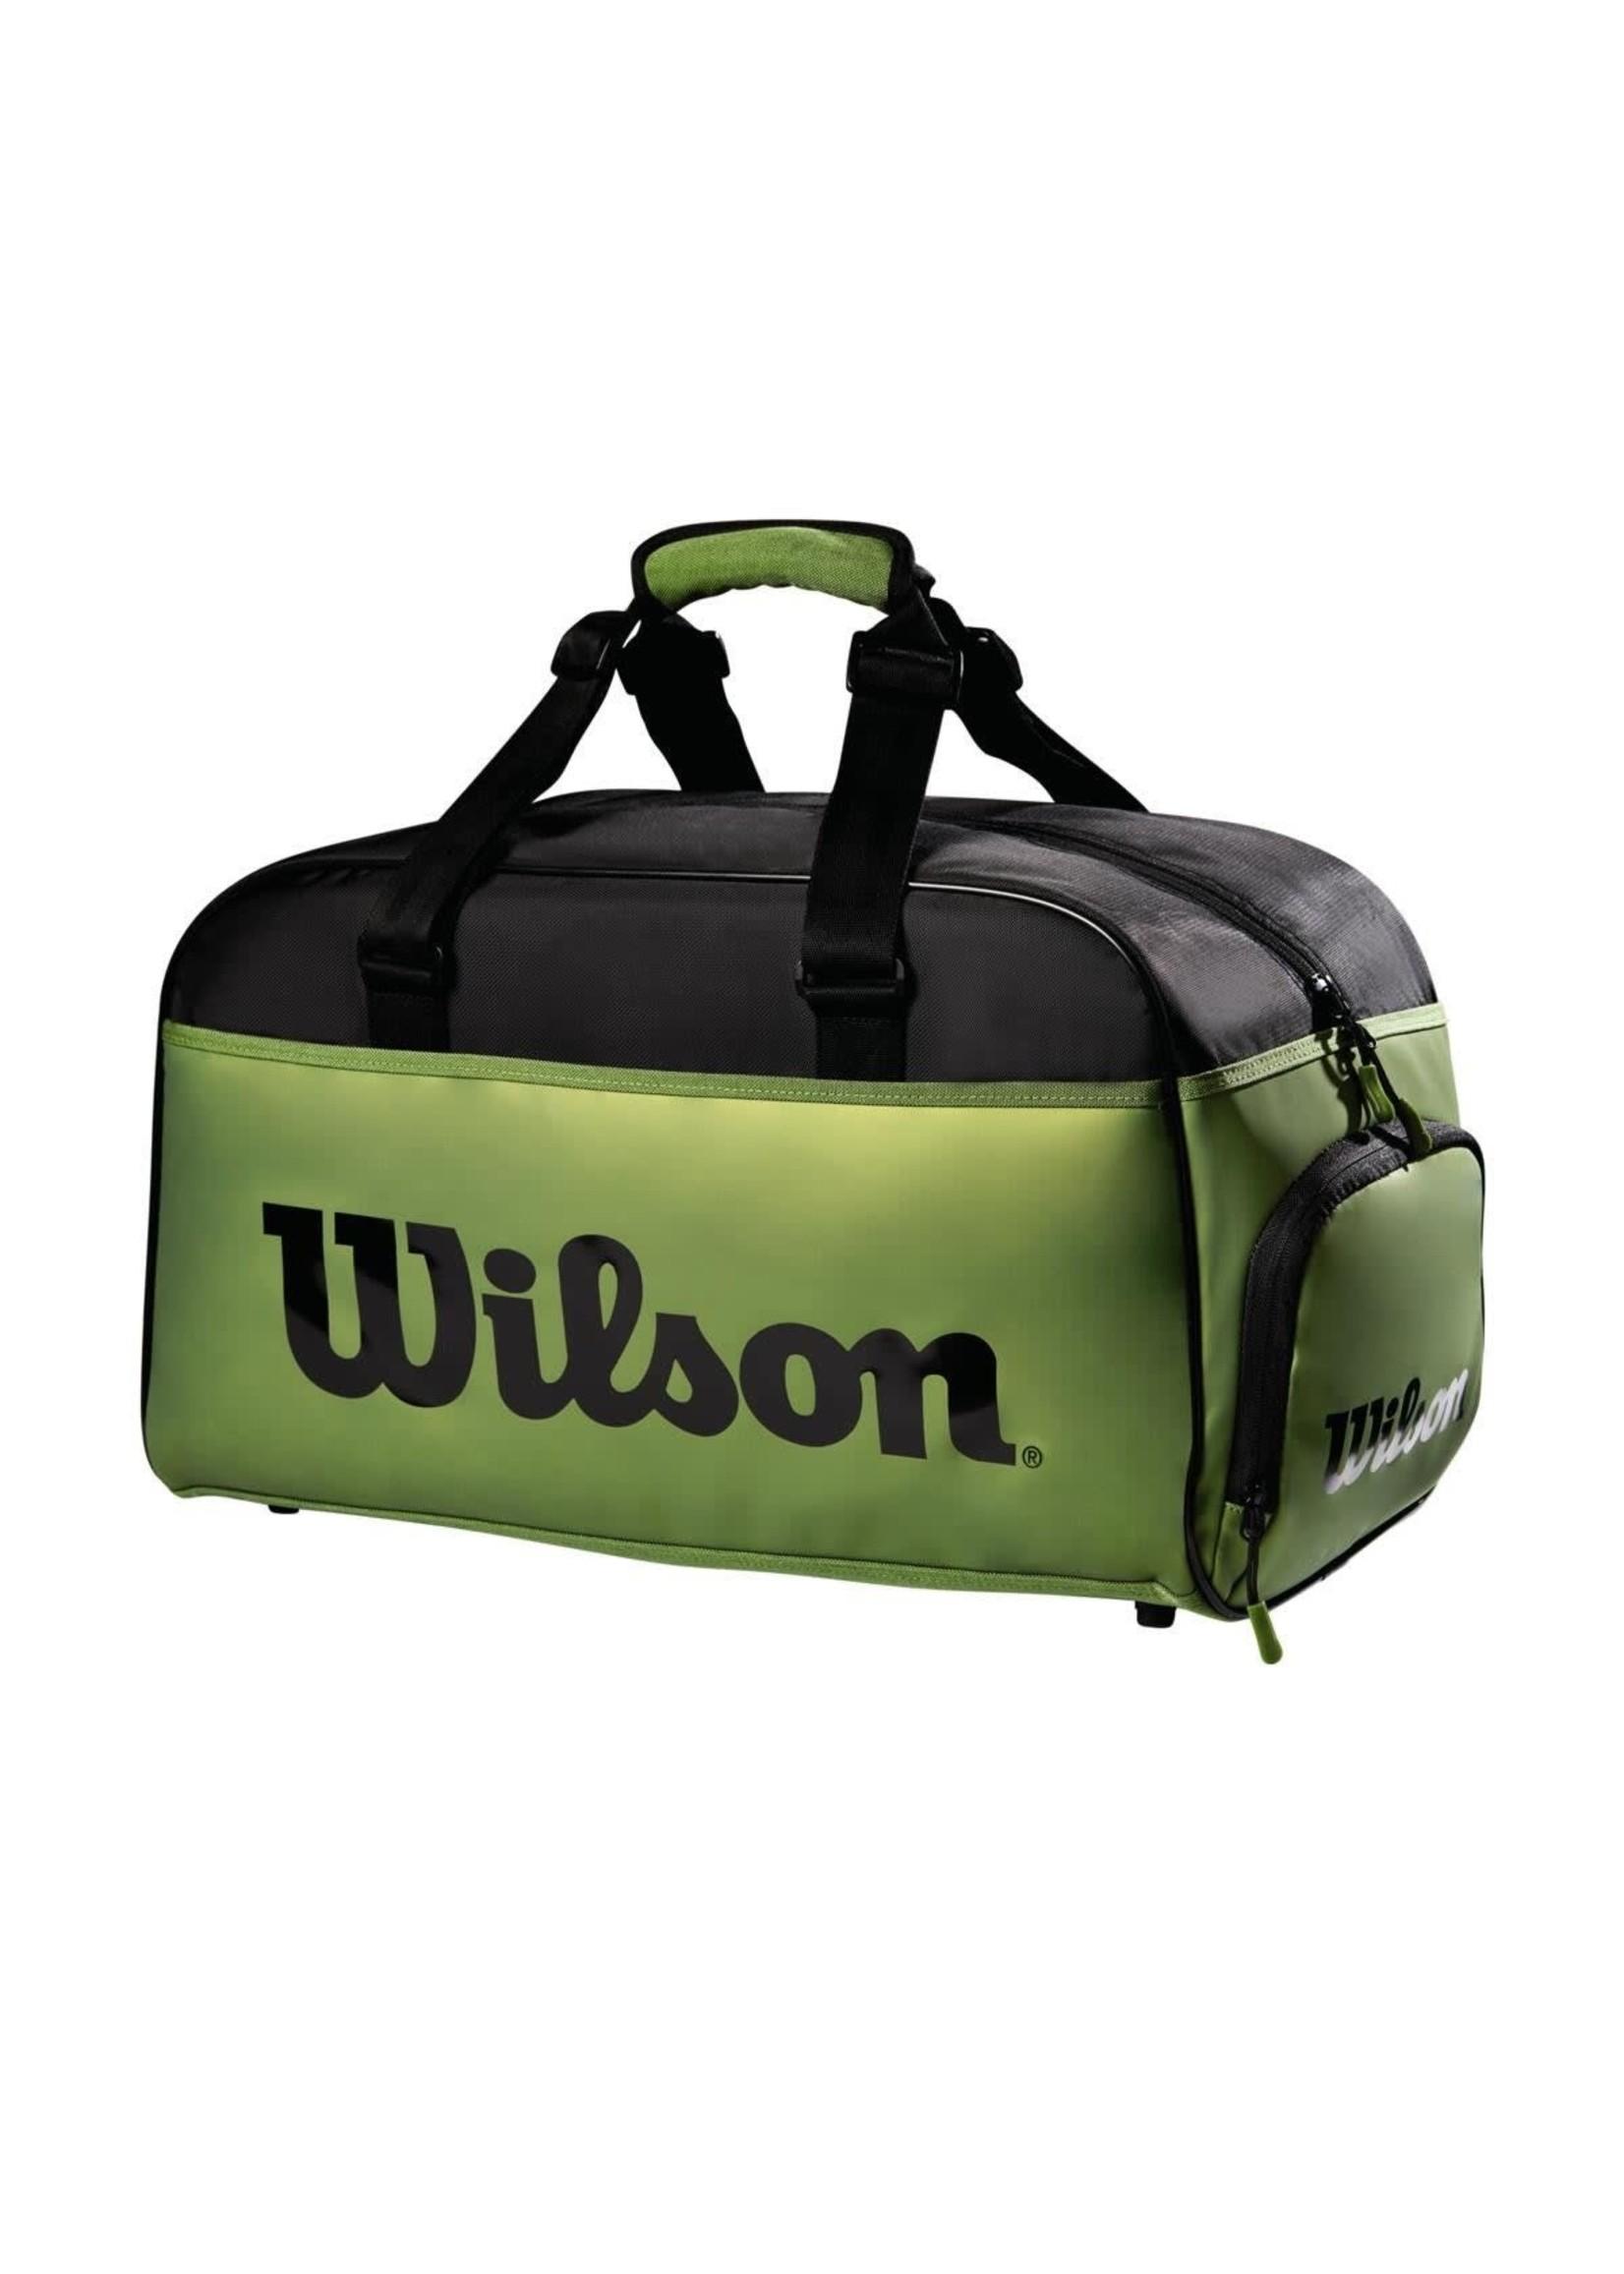 Wilson Wilson Blade Super Tour Duffle Bag (2022)